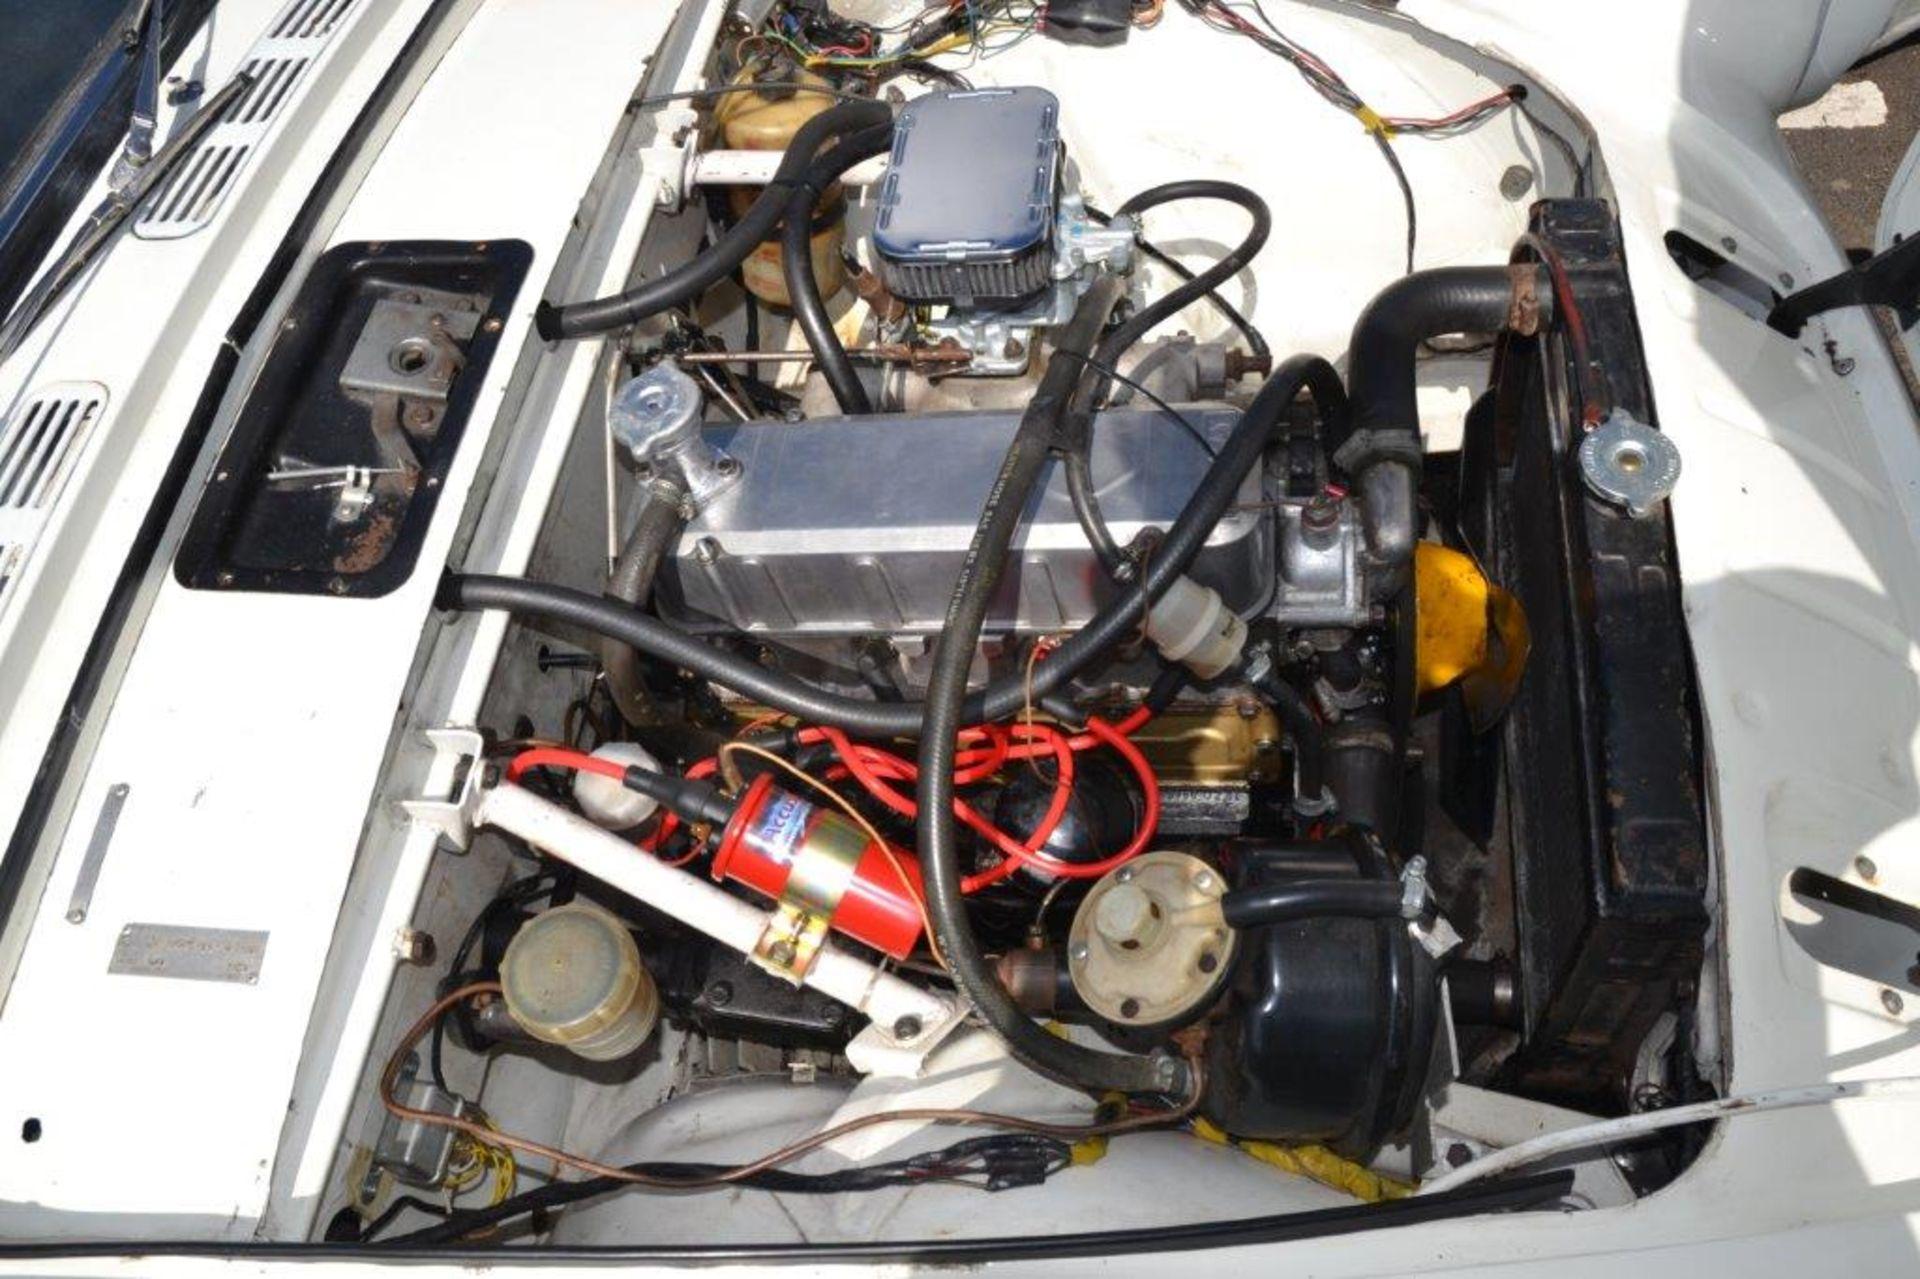 1967 Sunbeam Alpine Series V - Image 6 of 8